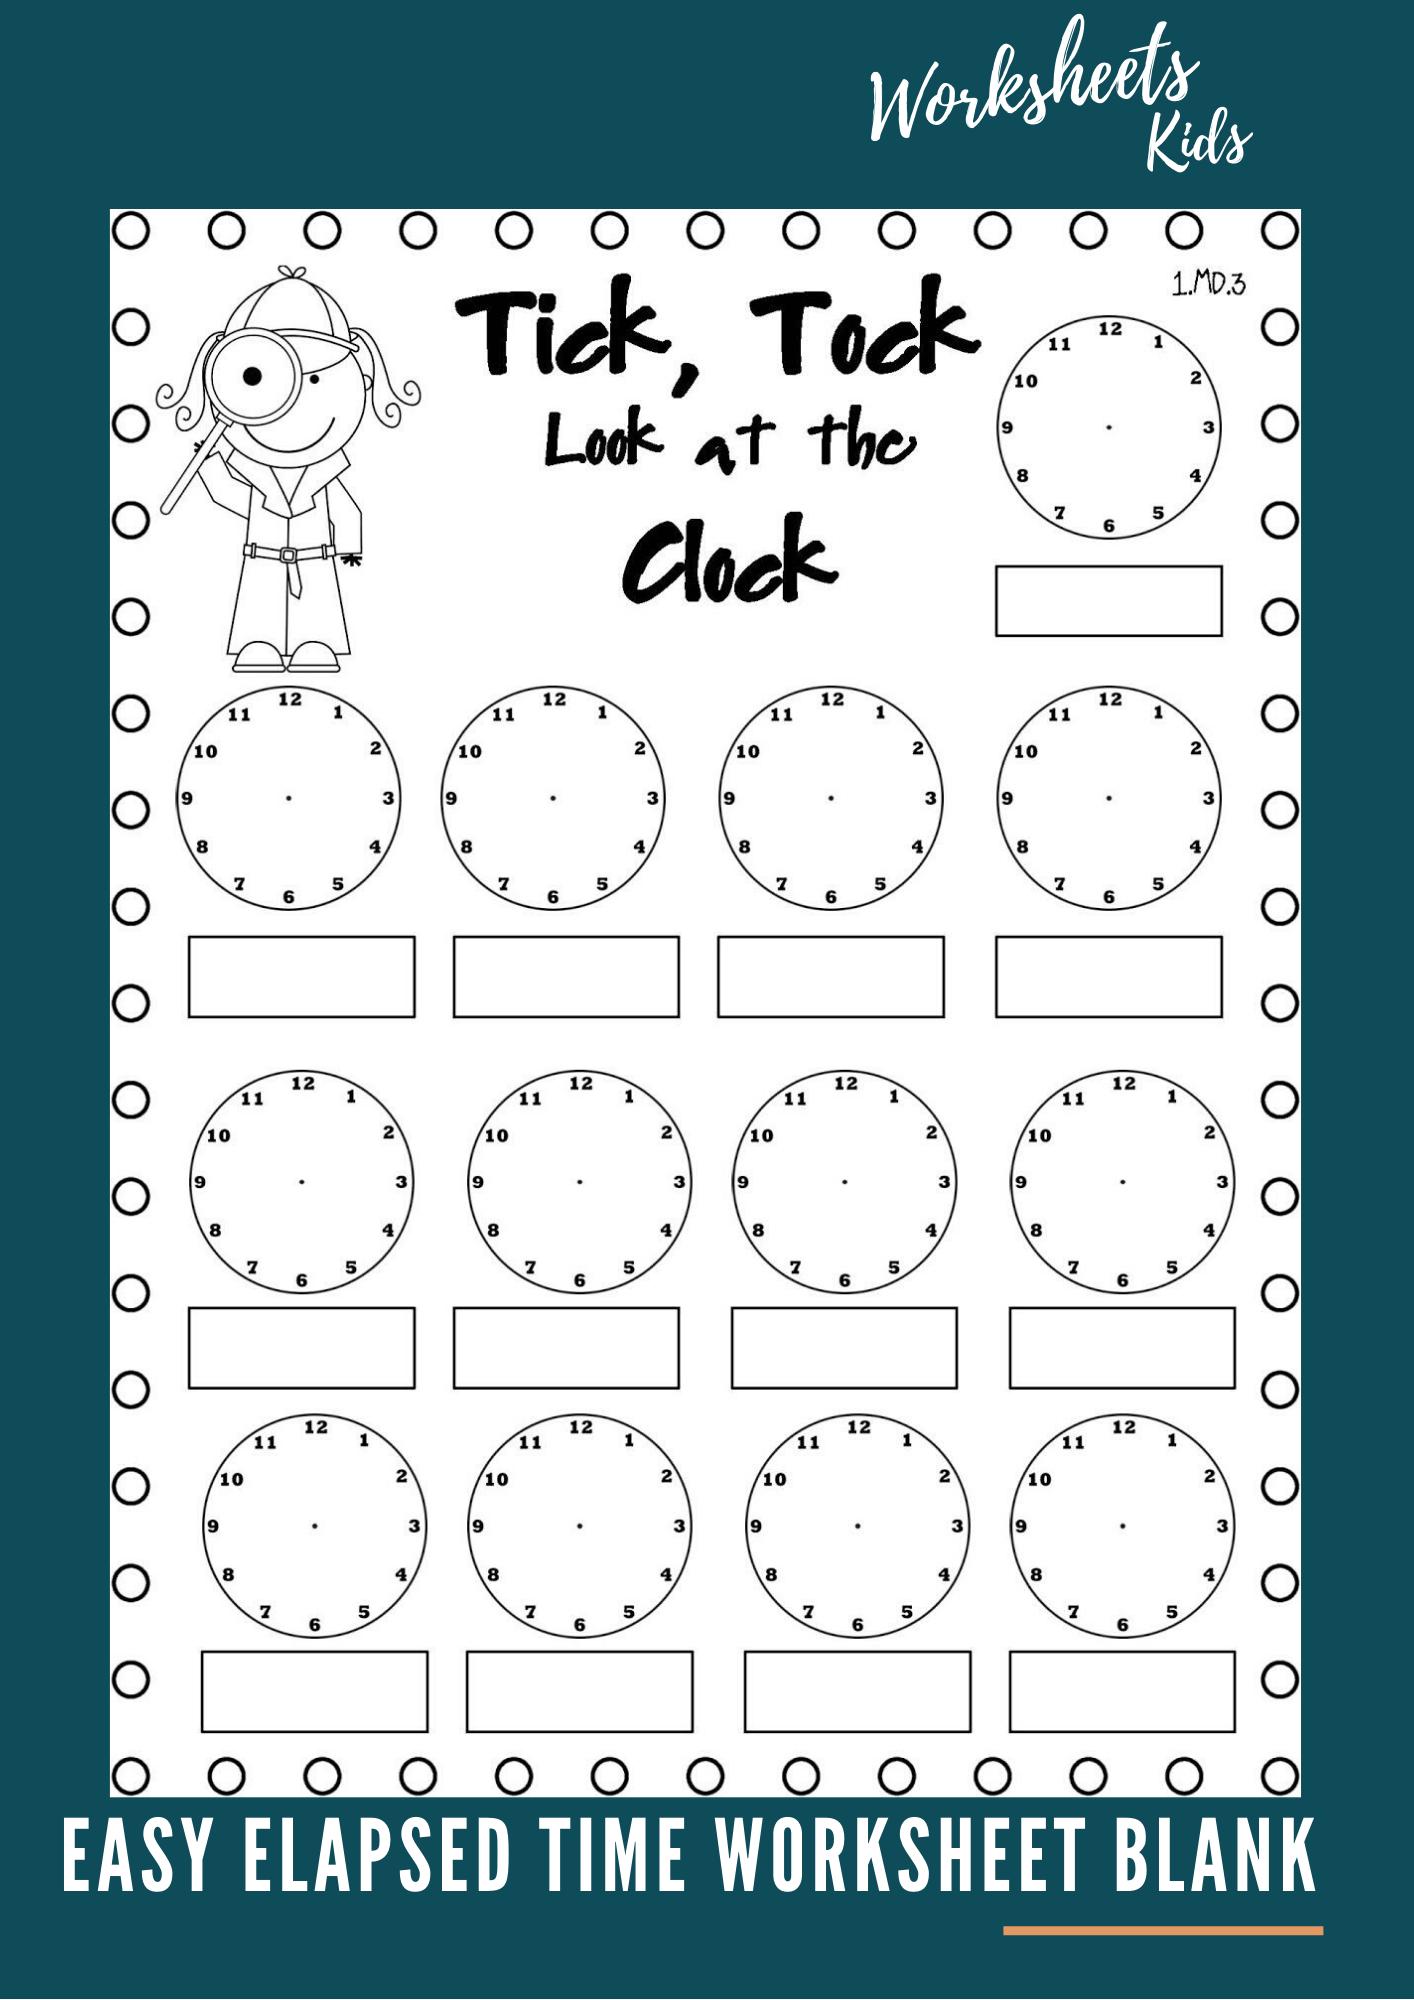 Easy Elapsed Time Worksheet Blank